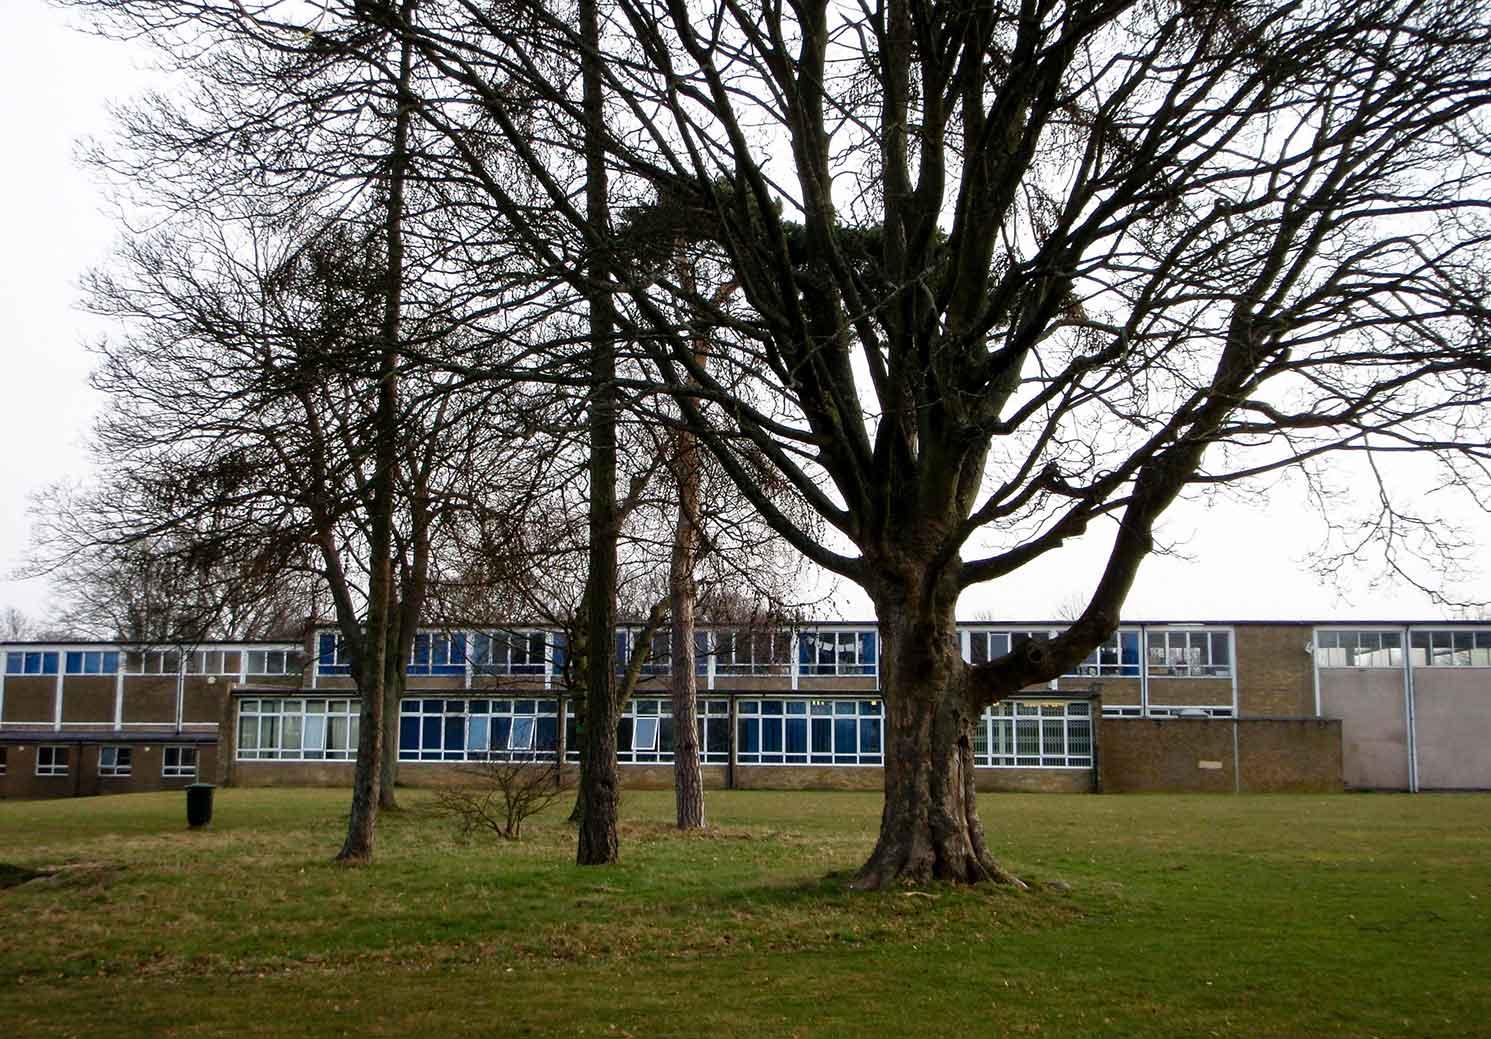 London schools